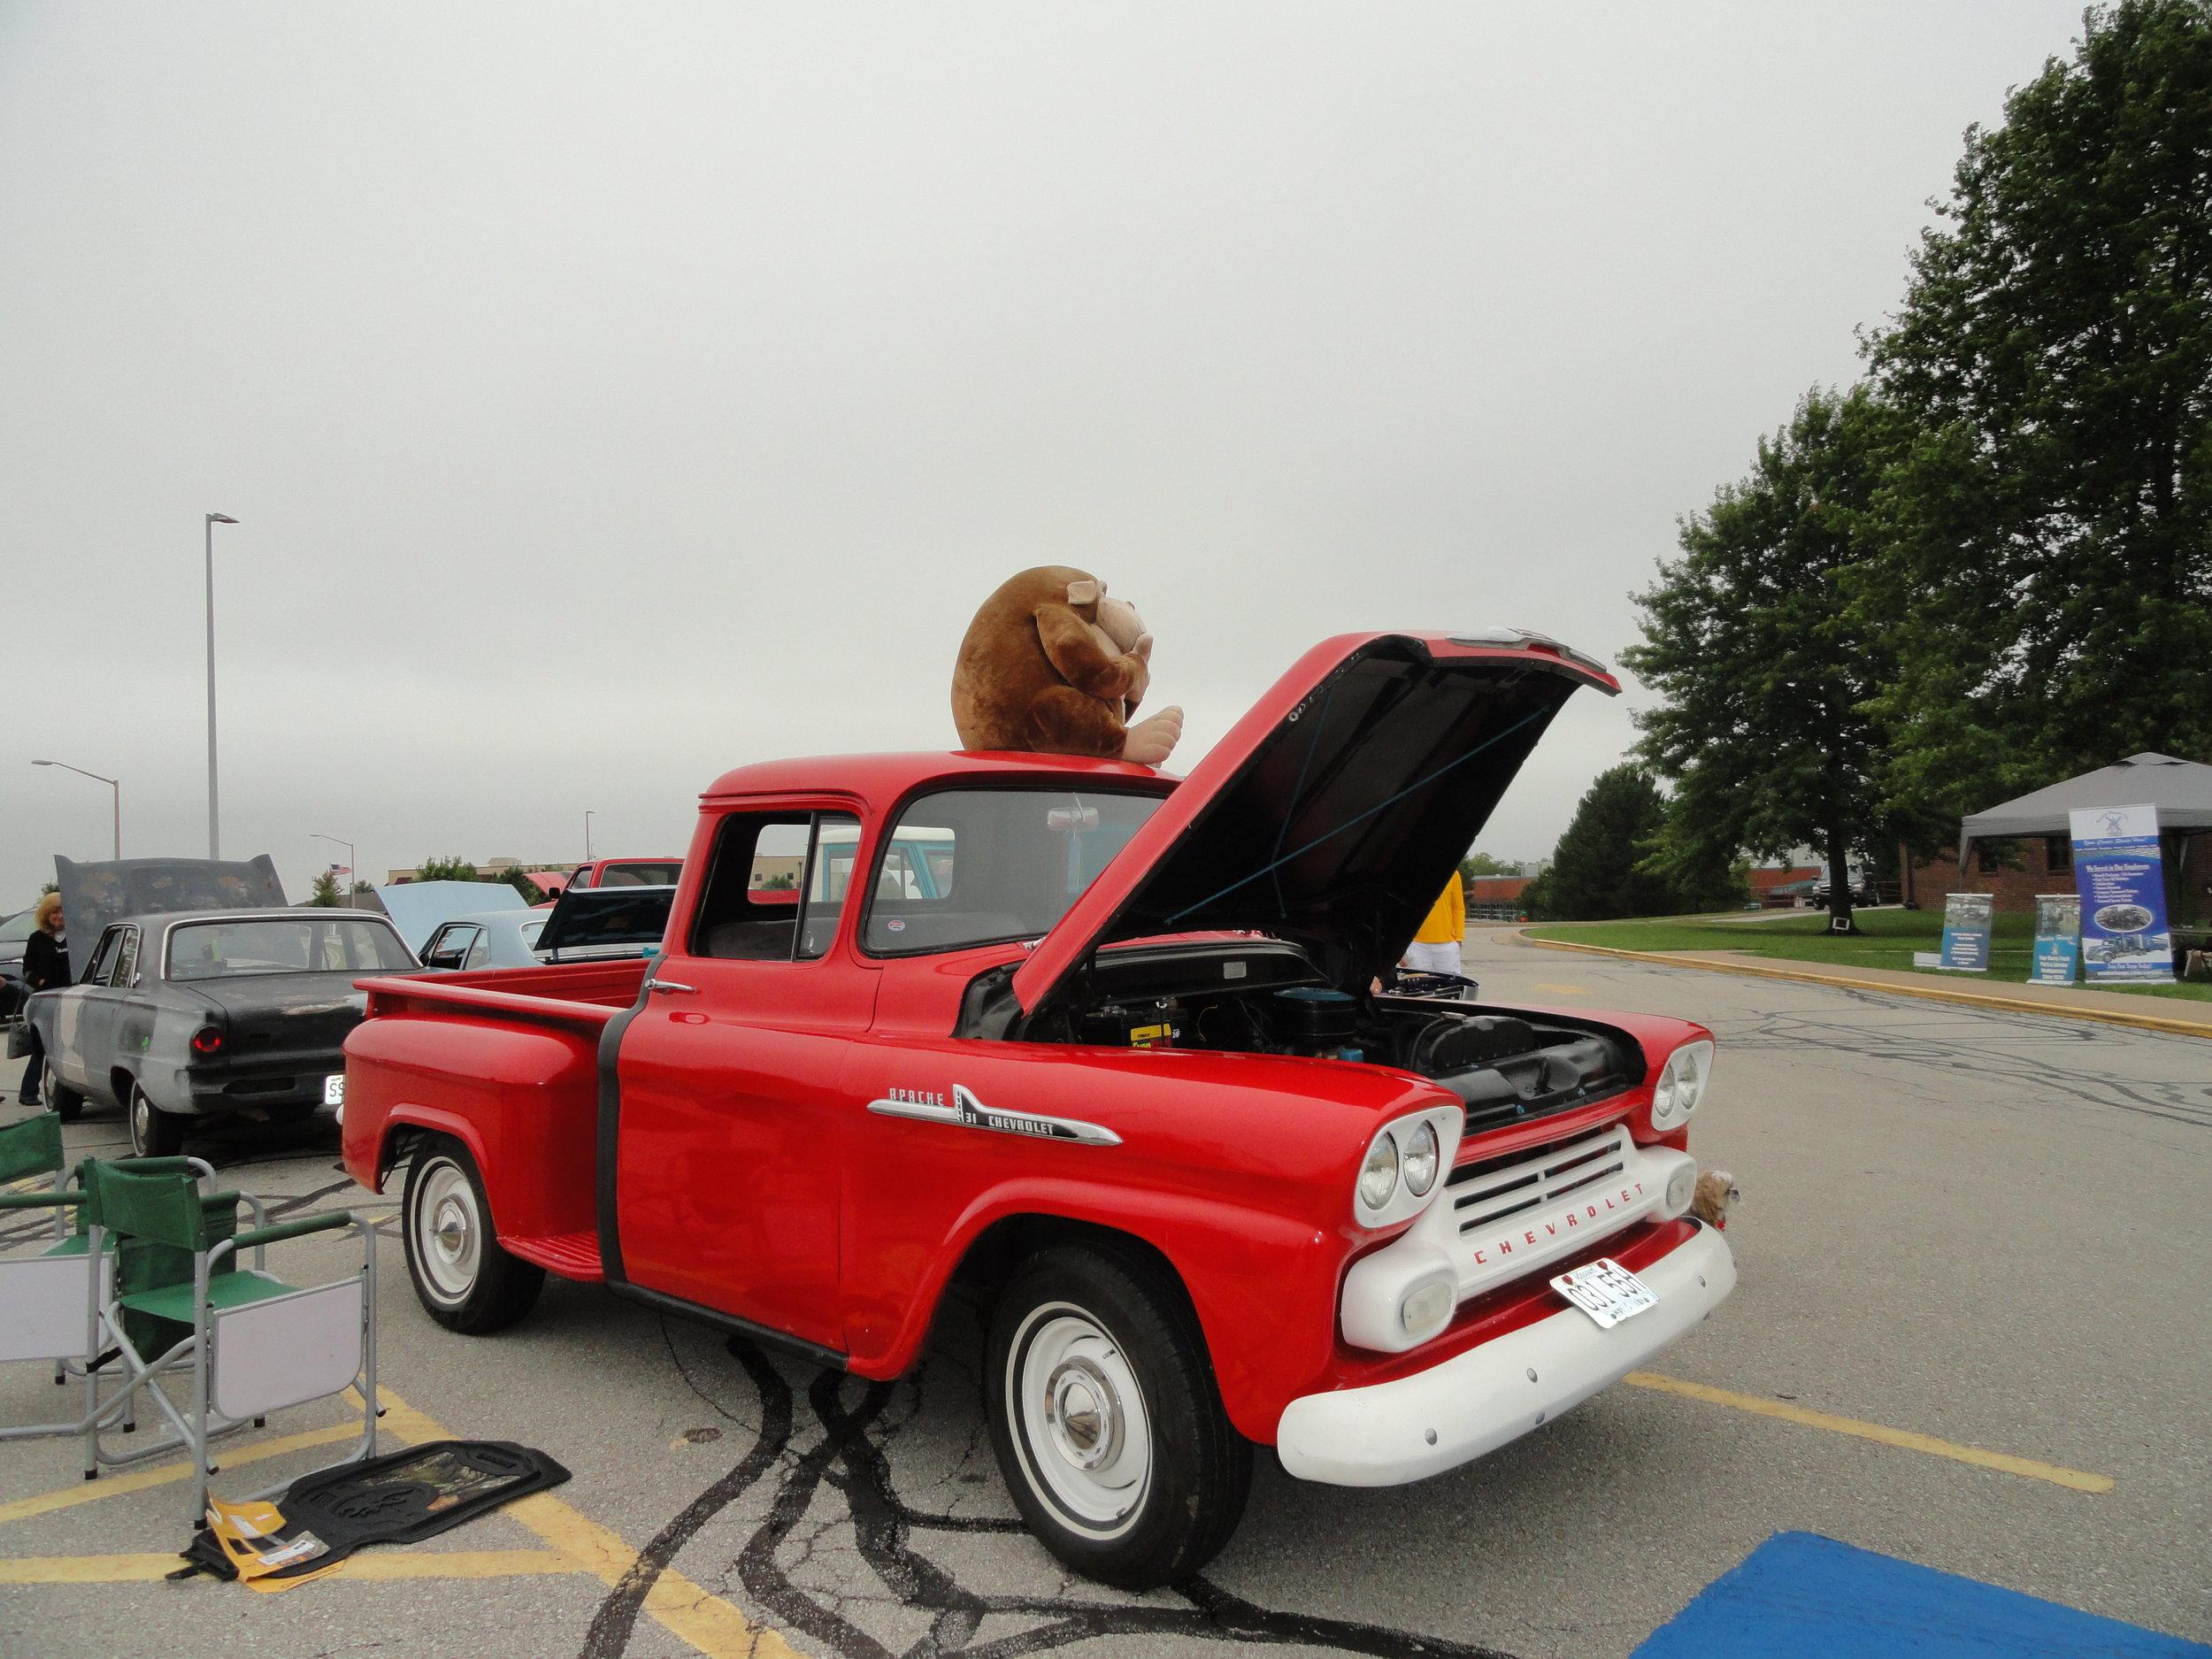 1955 chevy pickup.JPG